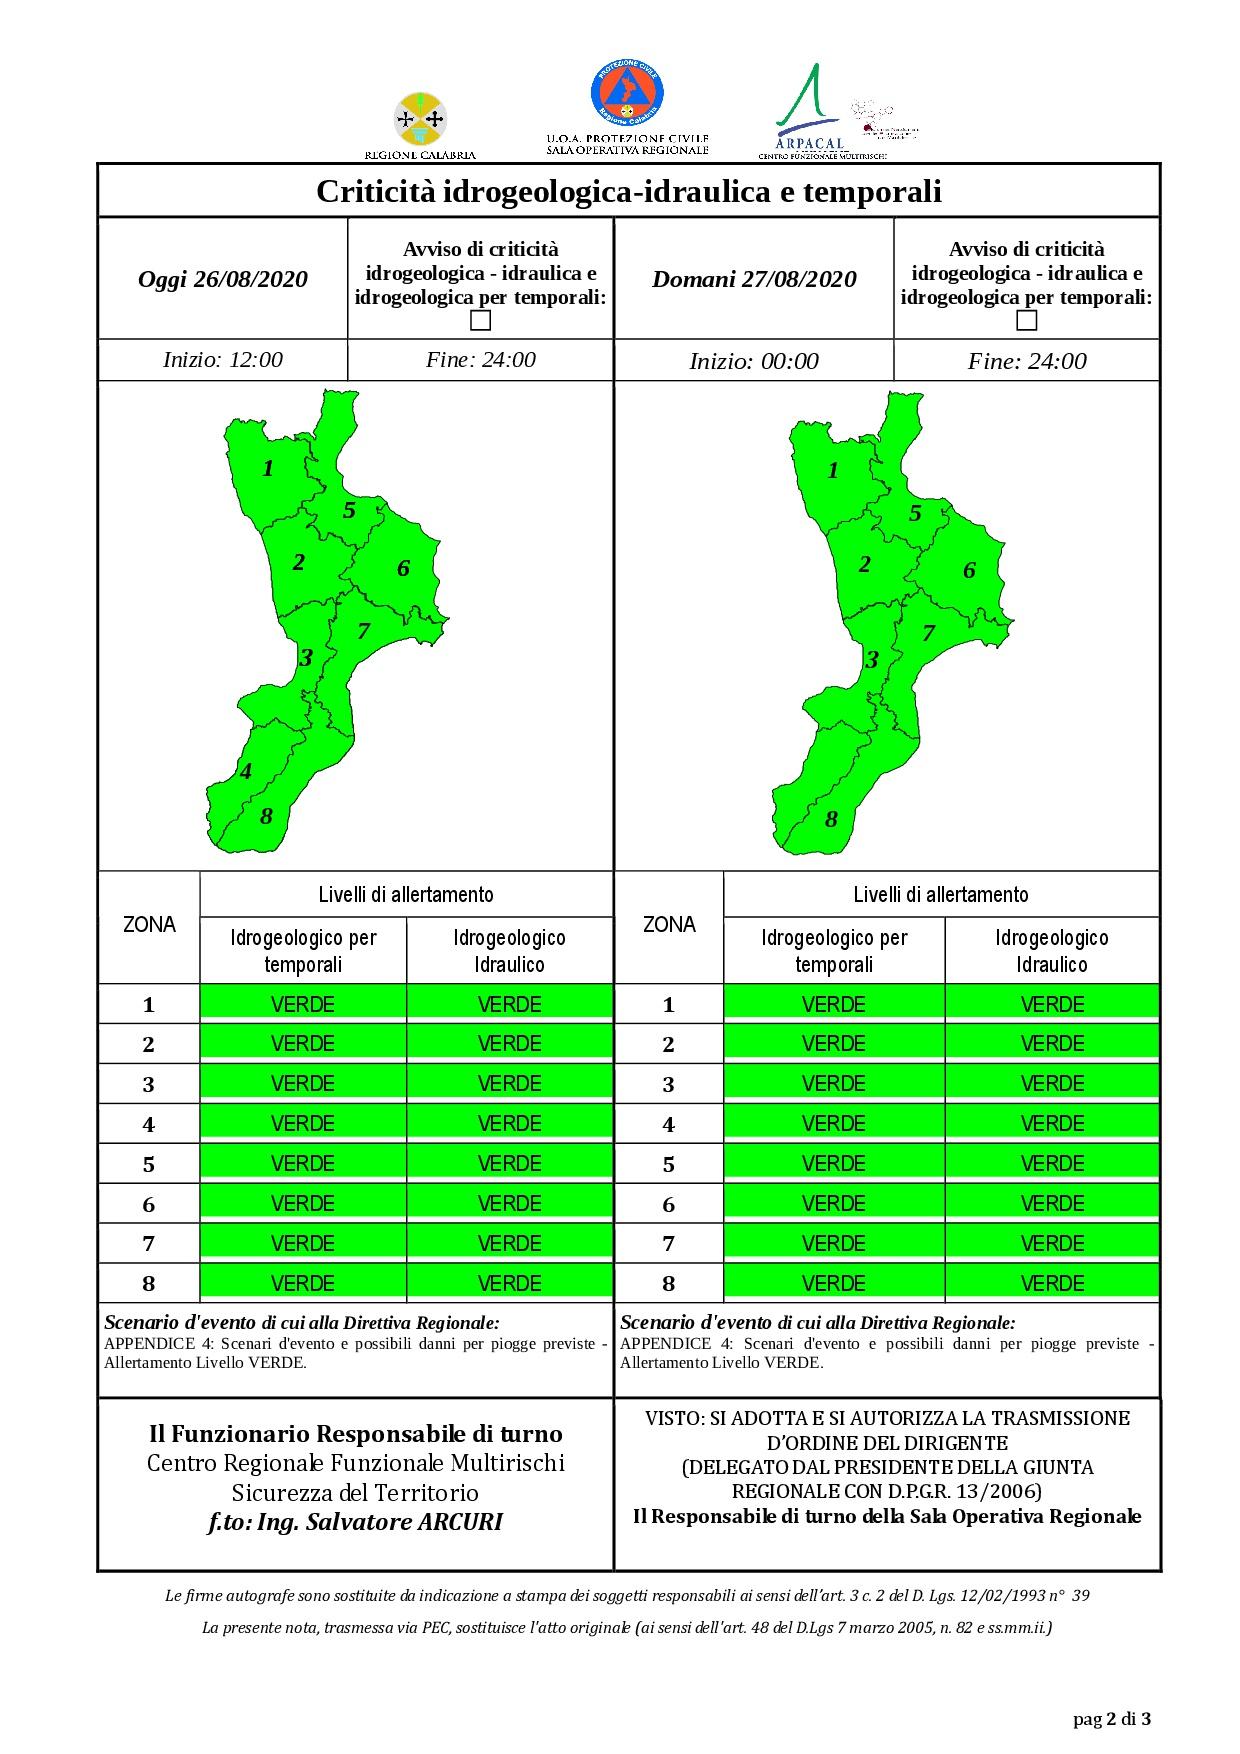 Criticità idrogeologica-idraulica e temporali in Calabria 26-08-2020